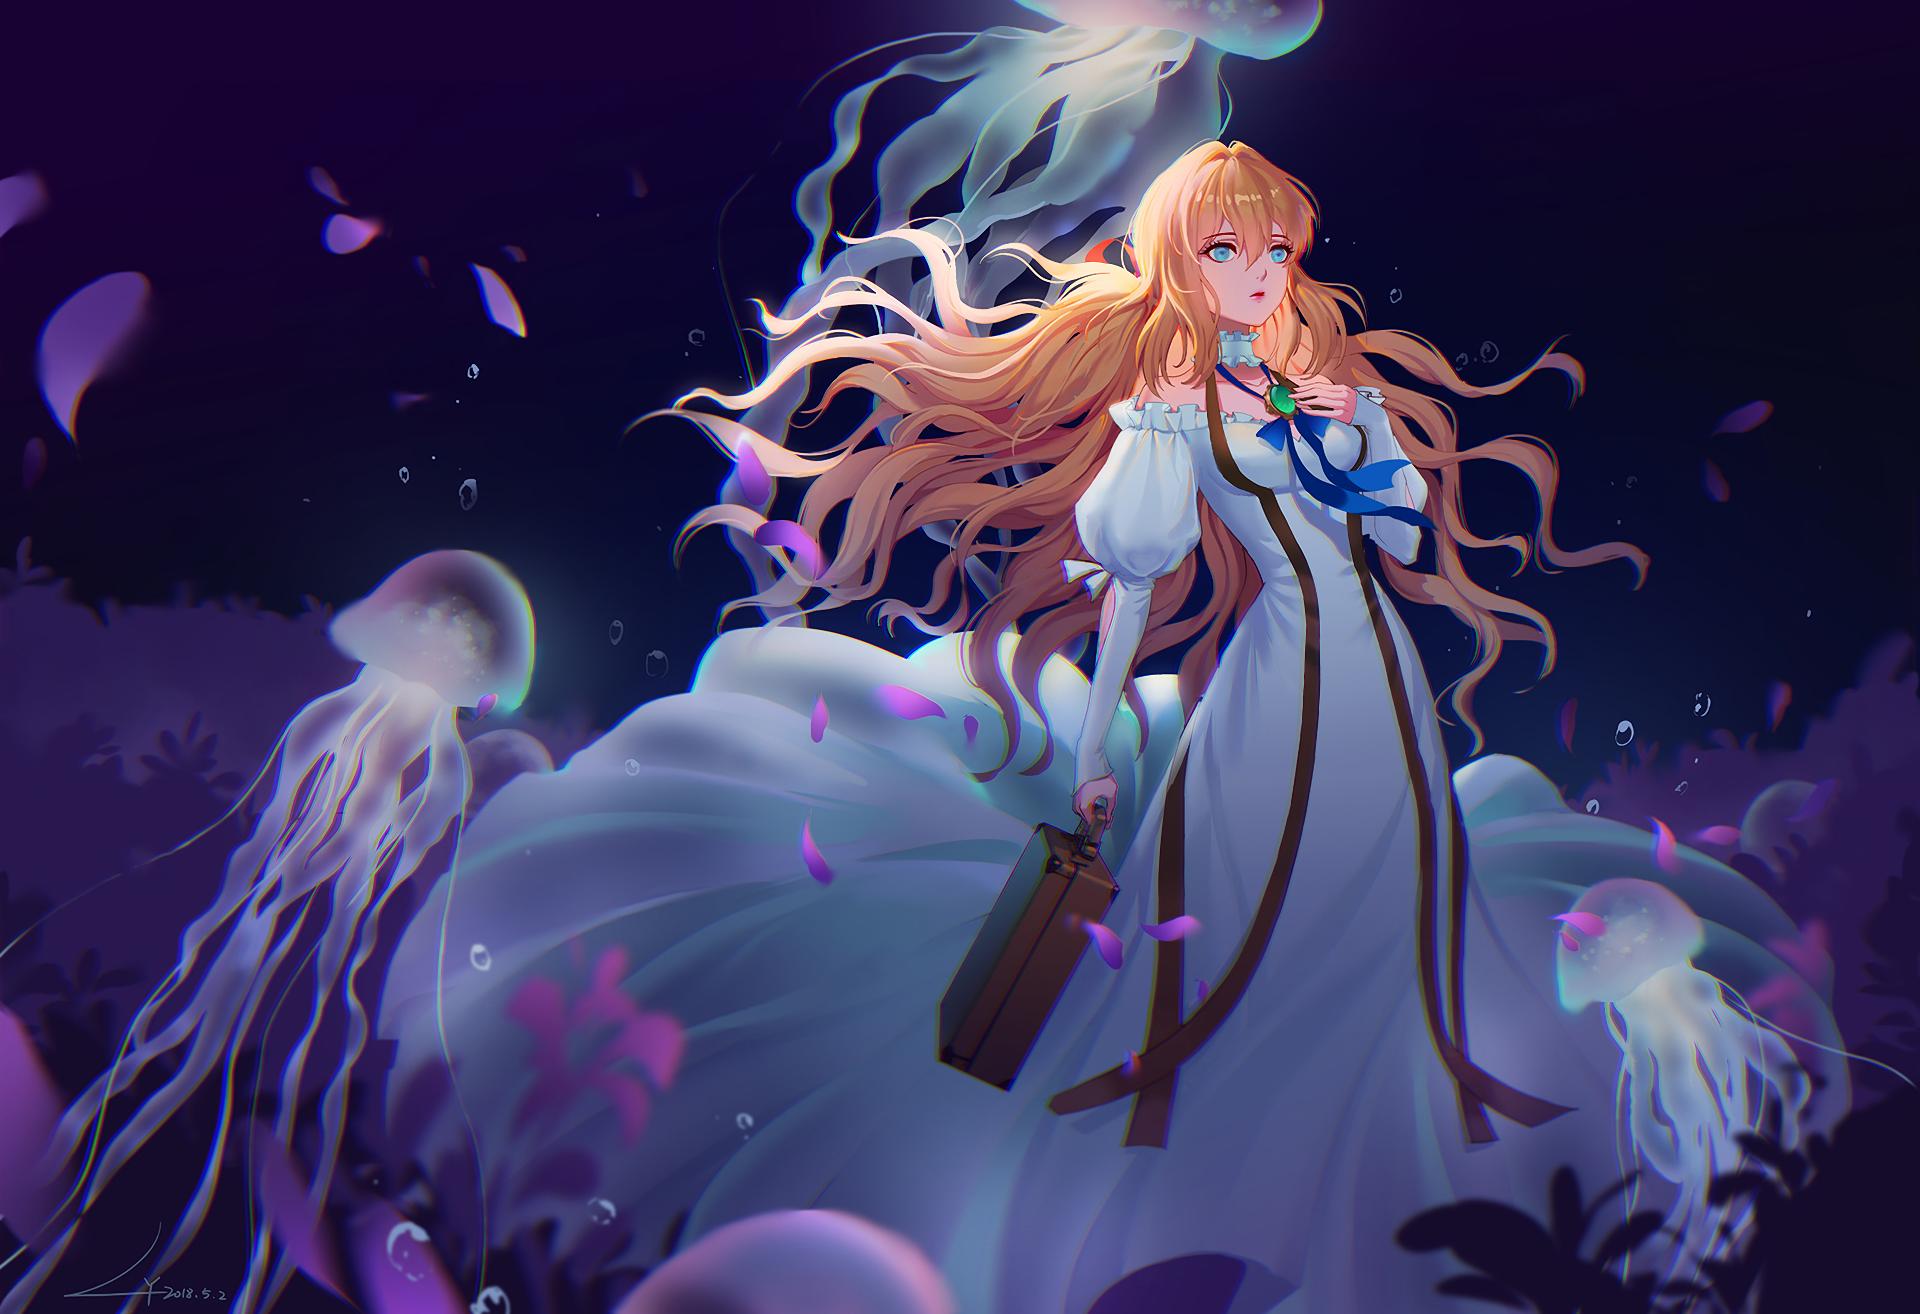 Violet Evergarden HD Wallpaper | Background Image ...